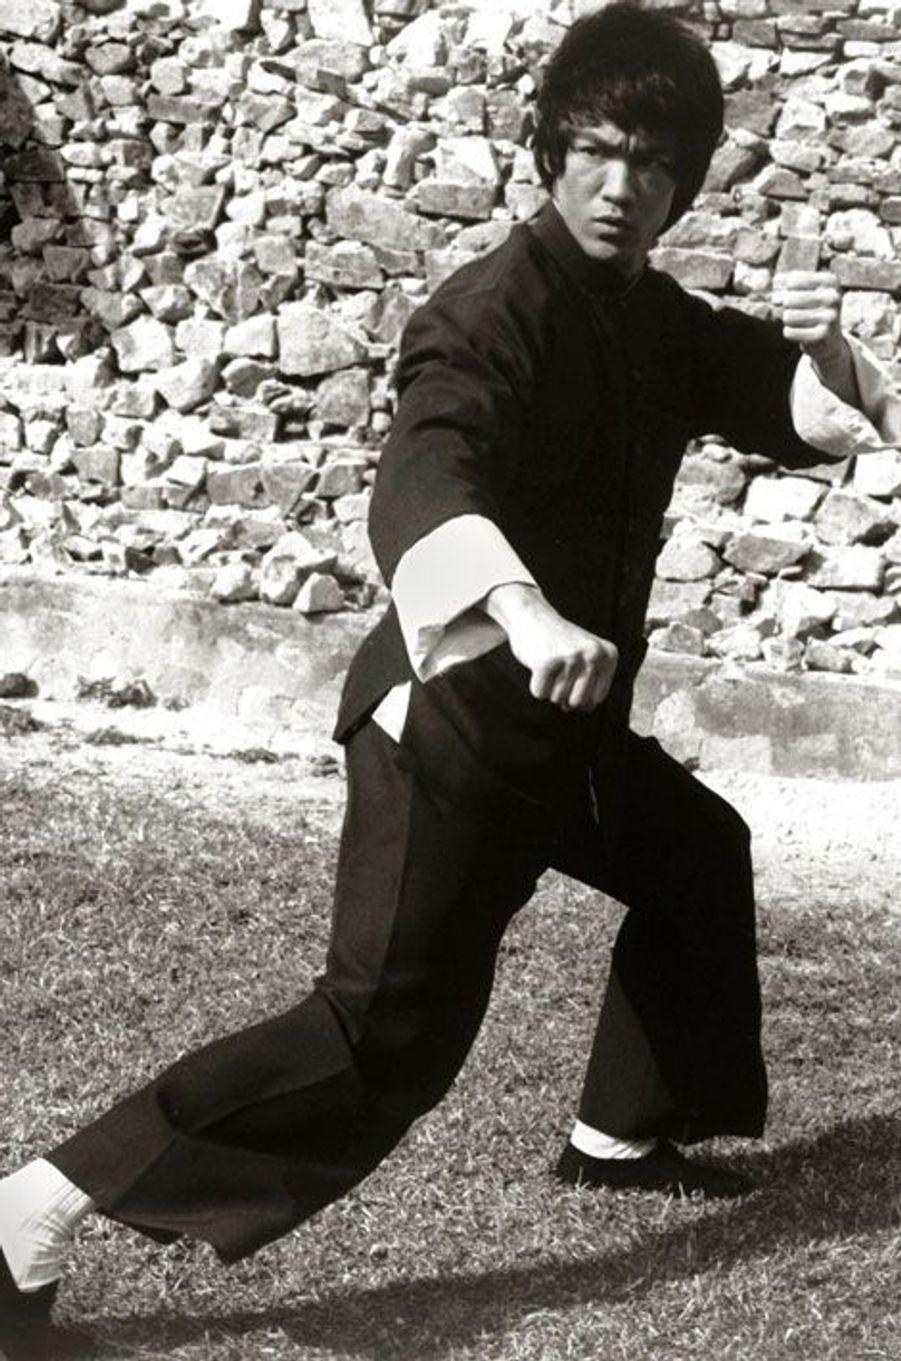 10- Bruce Lee 9 millions de dollars